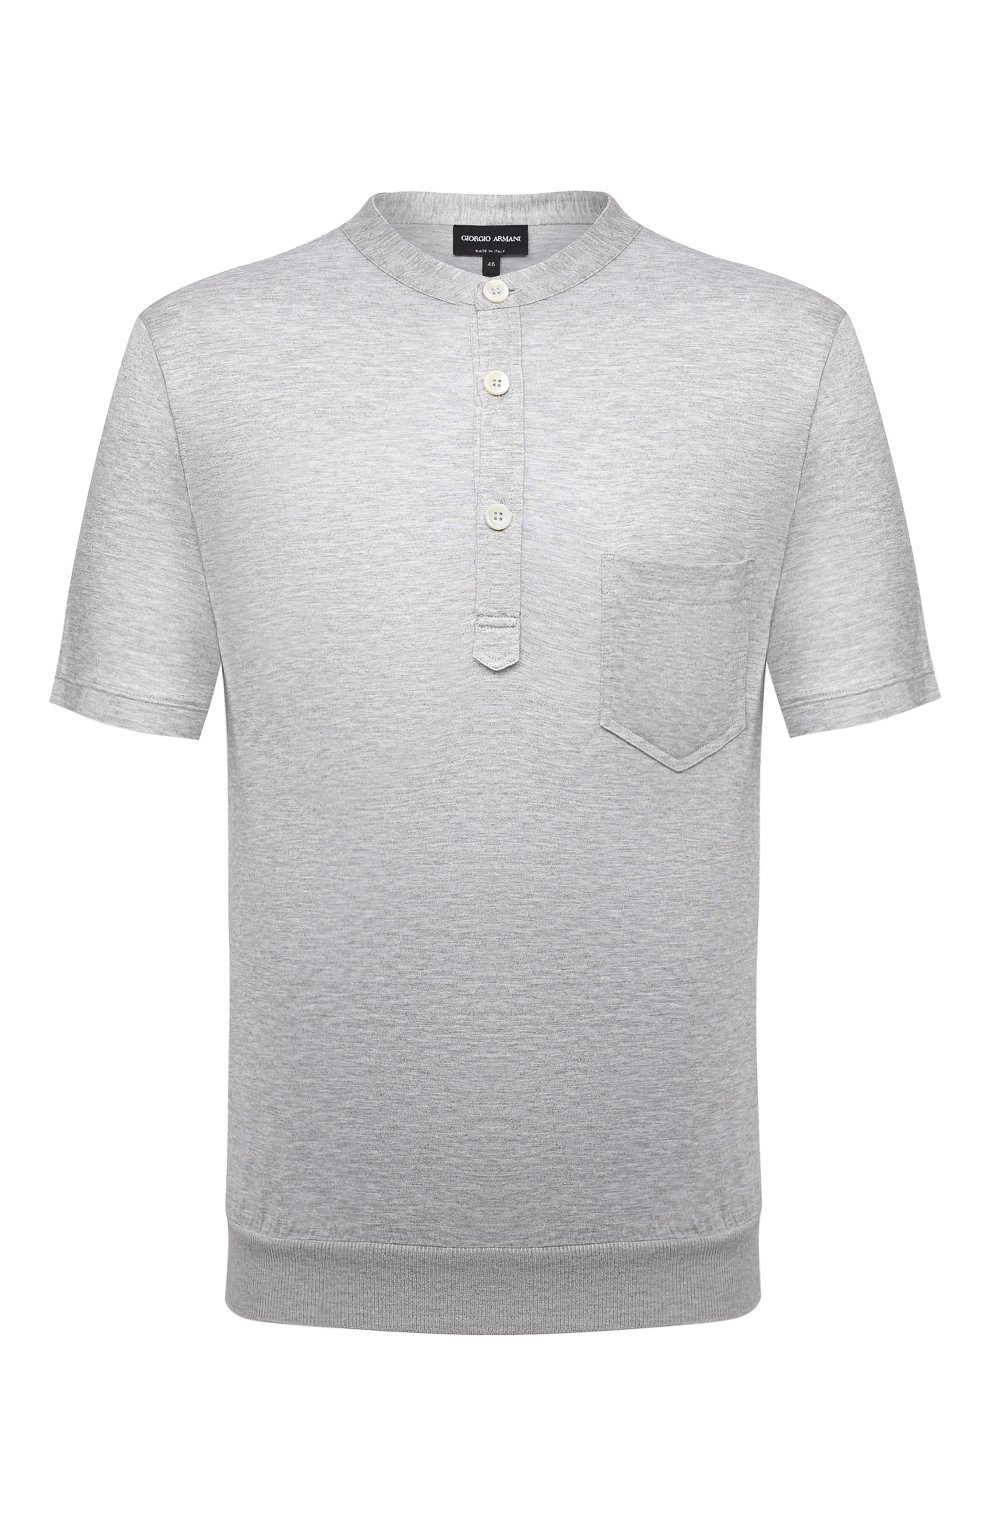 Мужская футболка из вискозы GIORGIO ARMANI серого цвета, арт. 3KSF50/SJYBZ | Фото 1